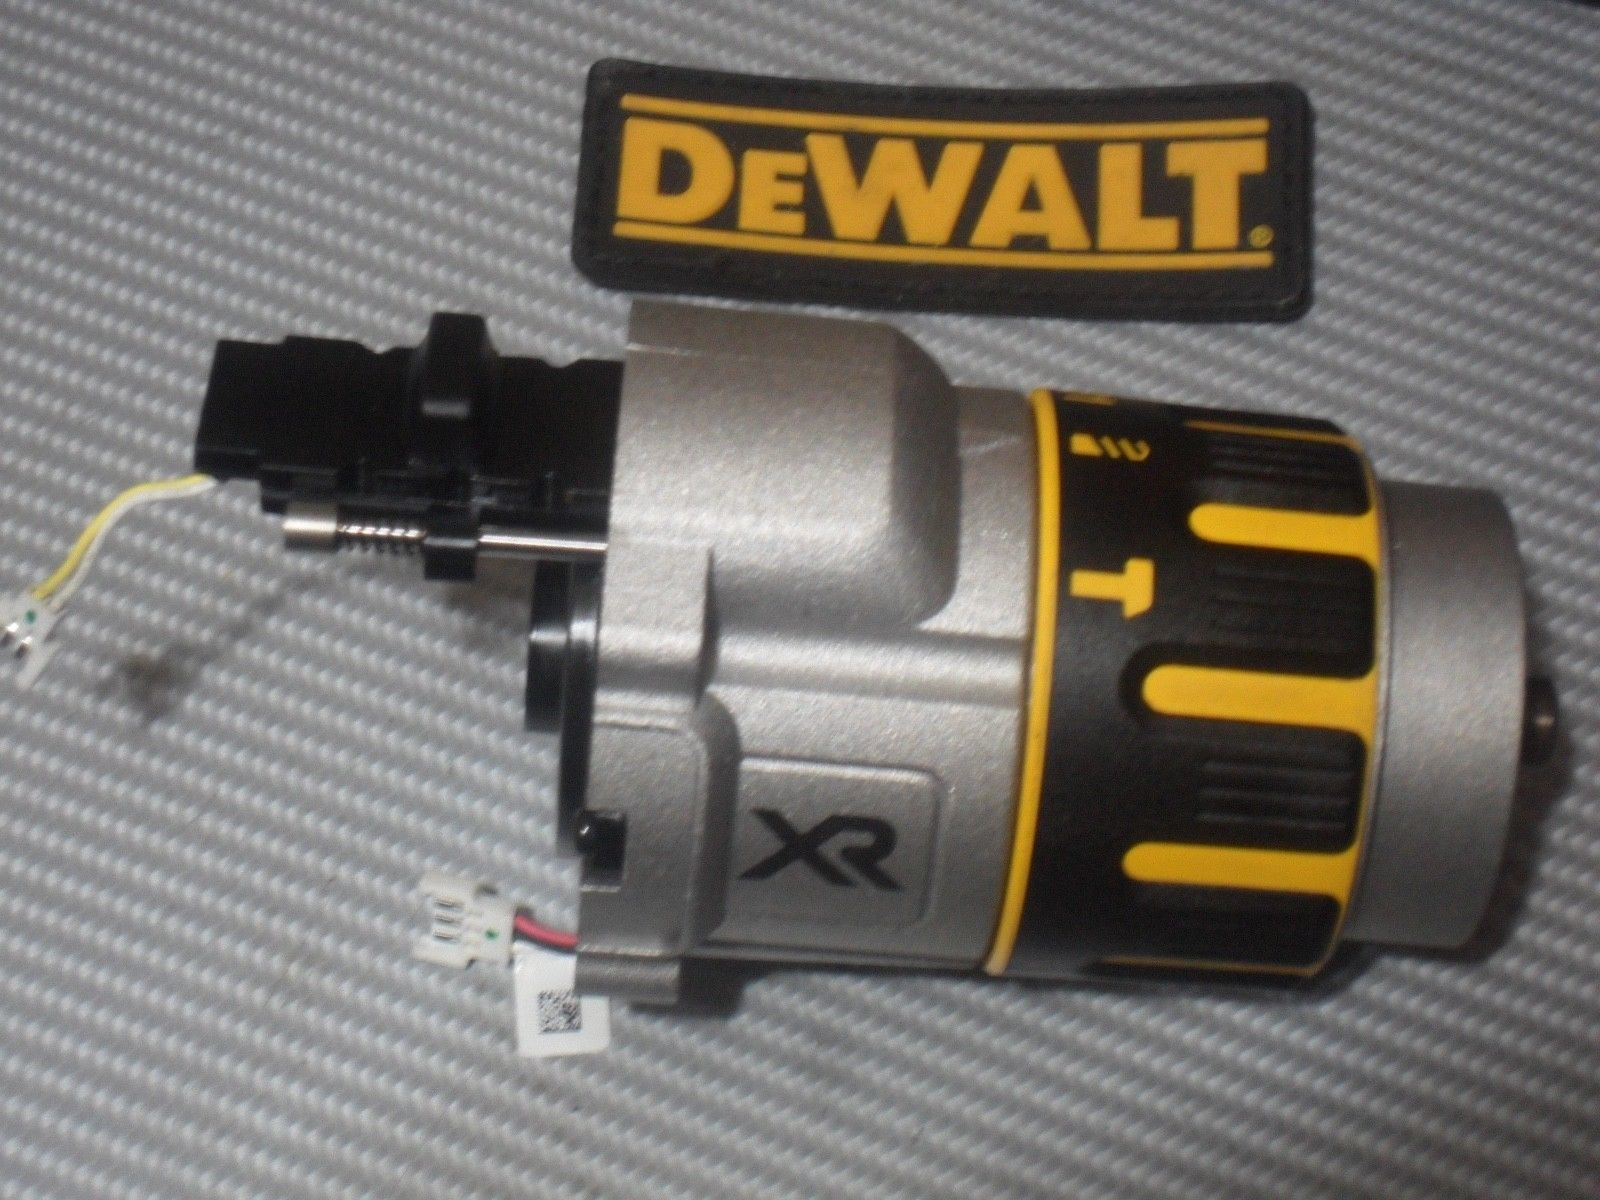 S L1600 Dewalt Xr Dcd995 20v Hammer Drill Gearbox